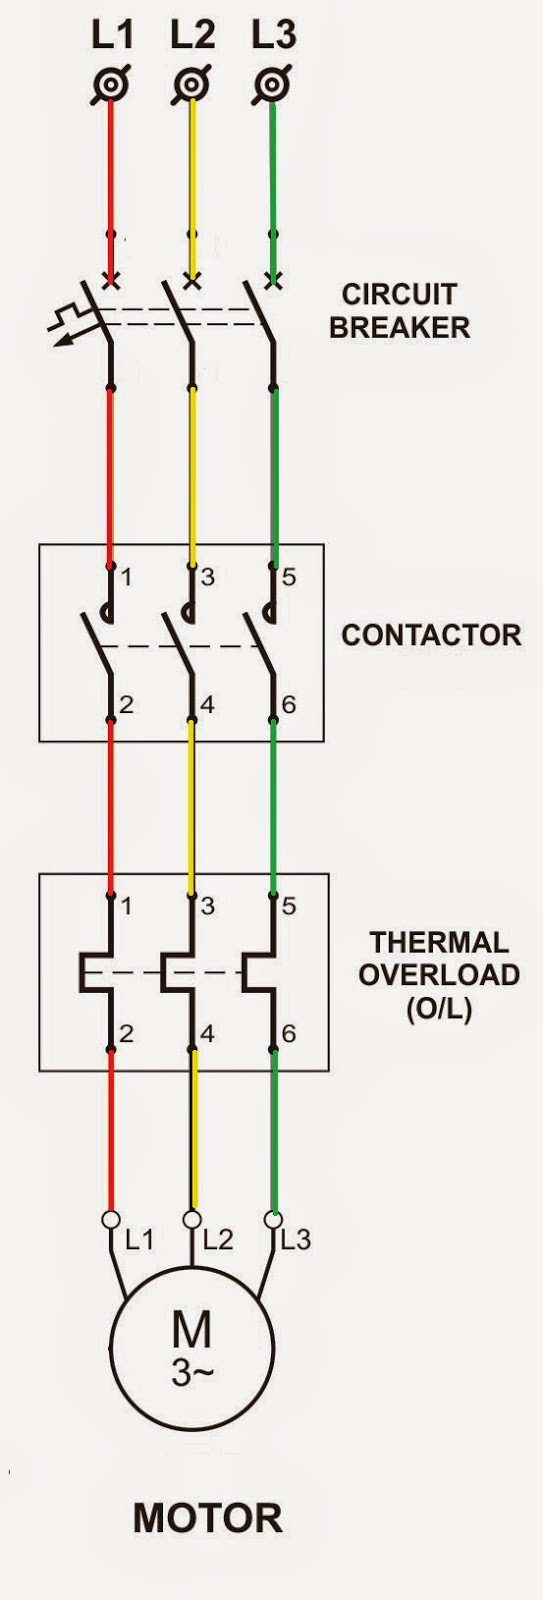 Single Phase Dol Starter Wiring Diagram Schematics and Wiring Diagrams